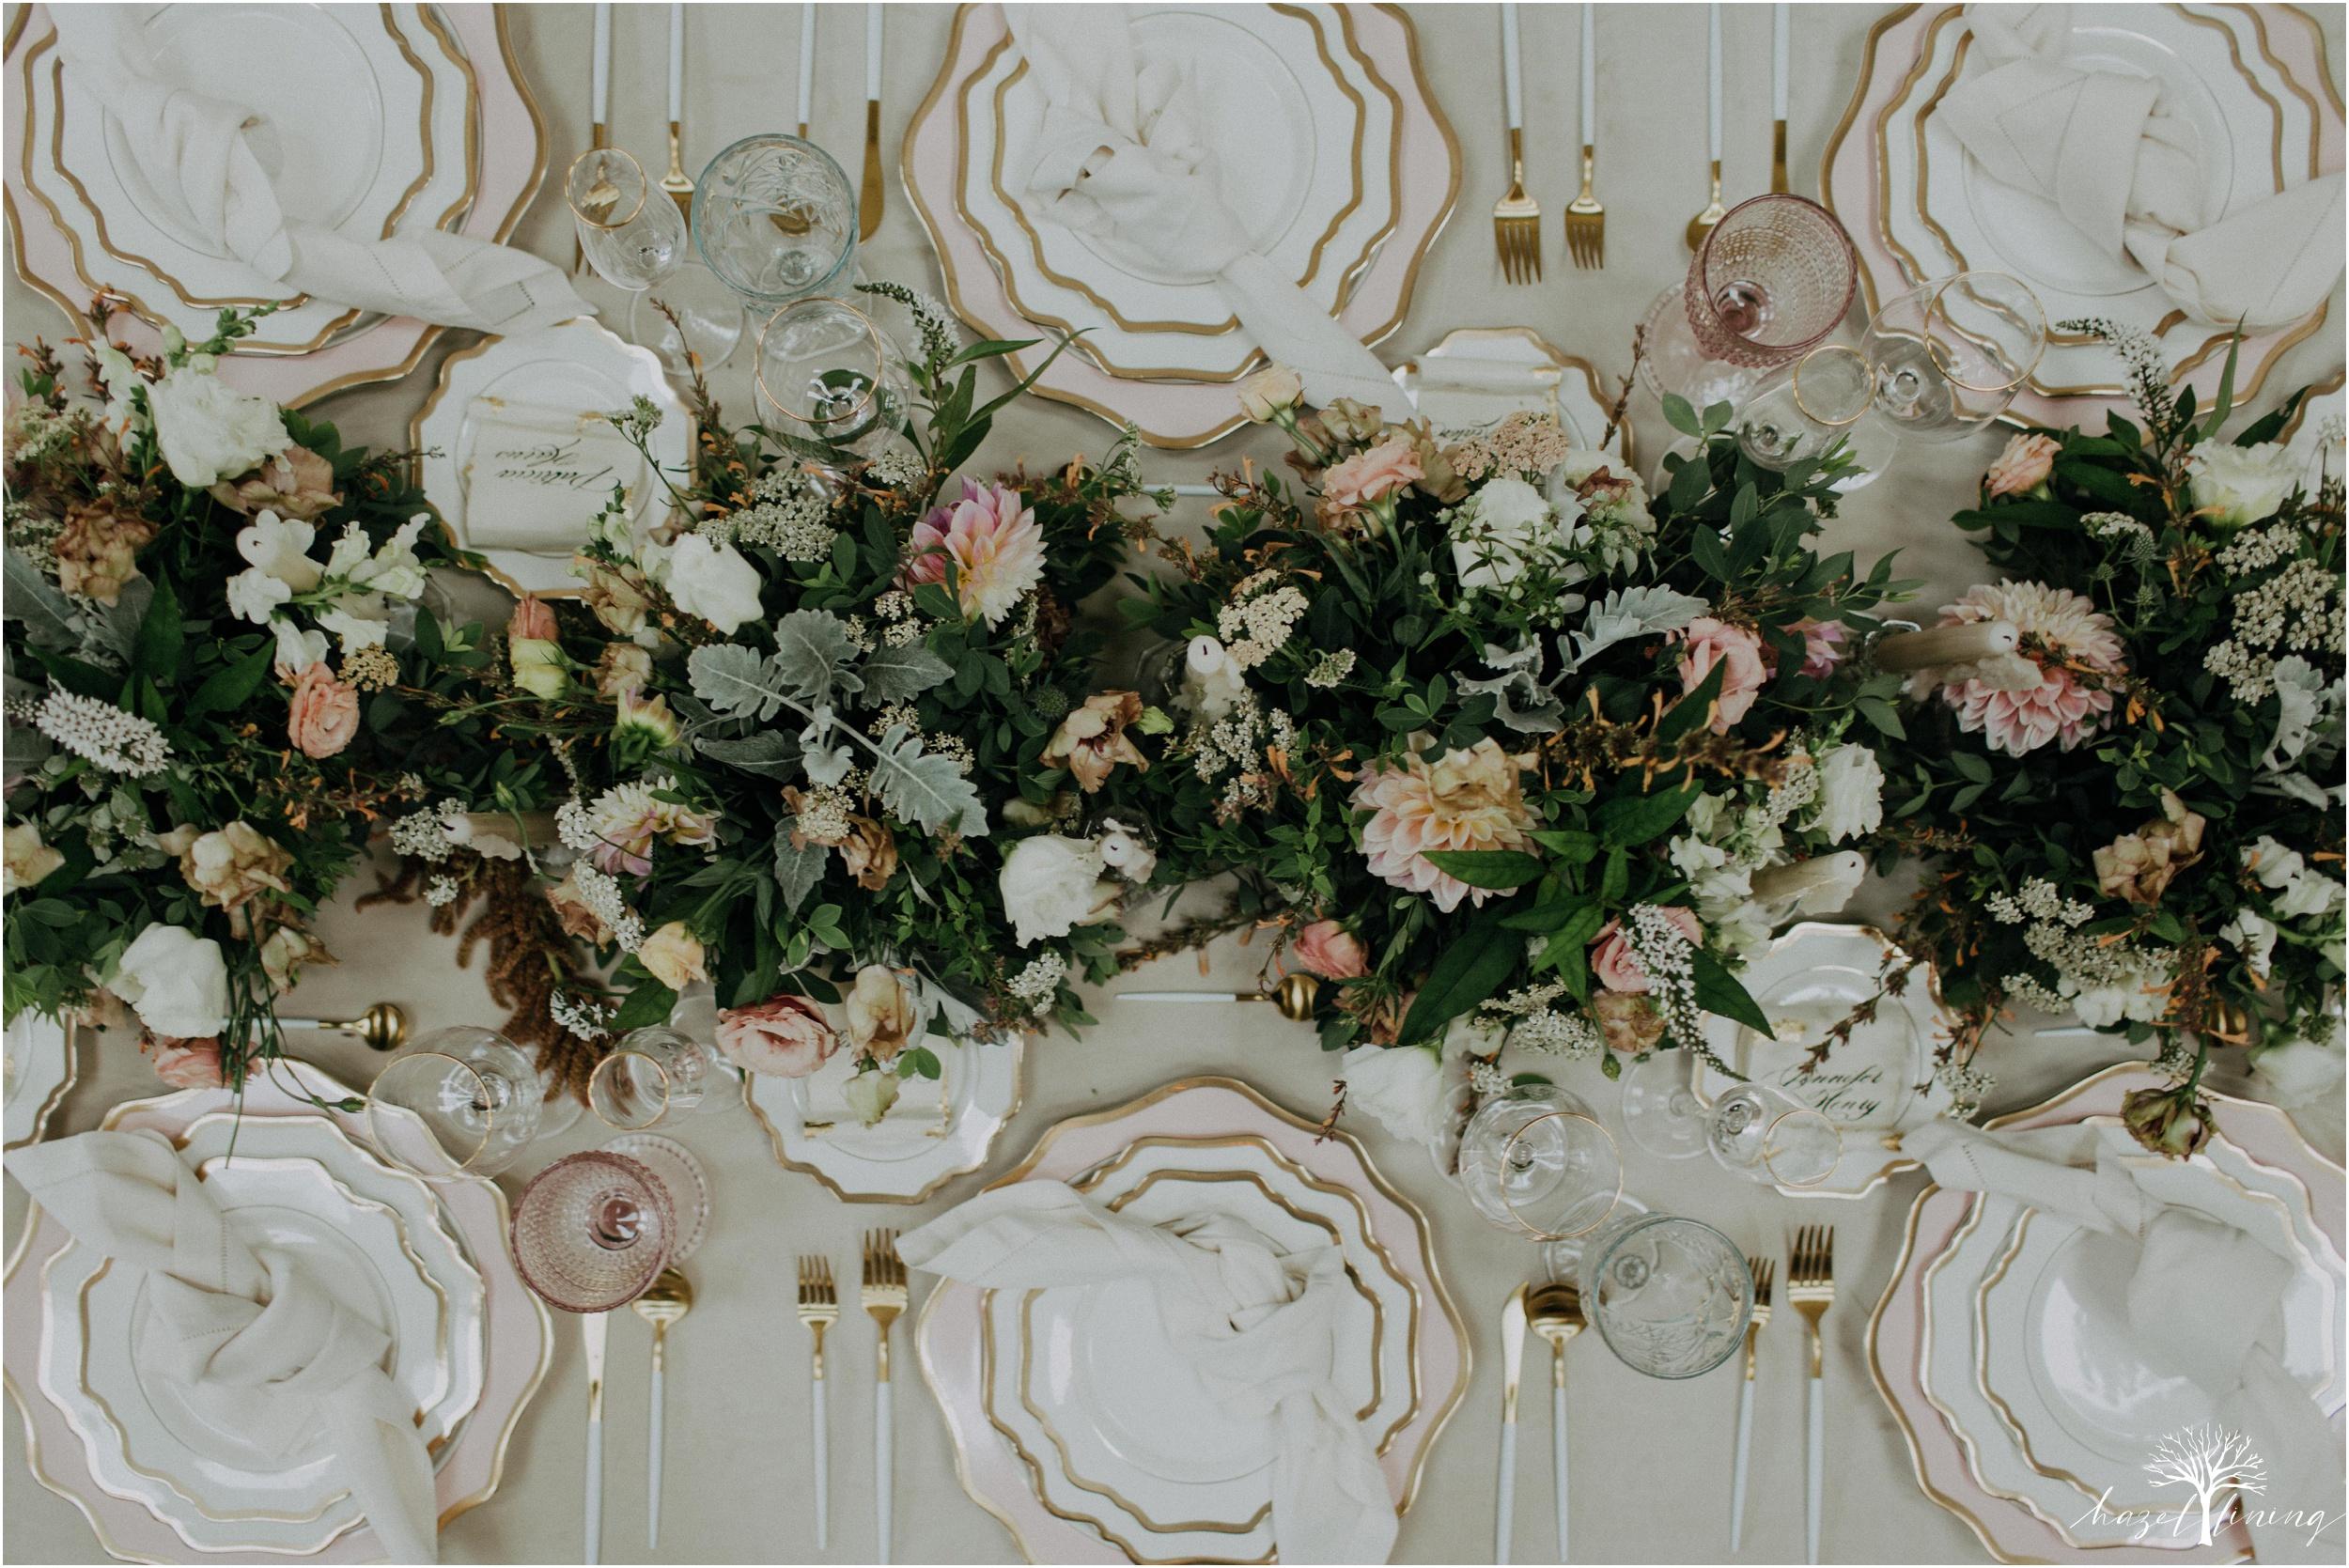 carl-chloe-the-ryland-inn-whitehouse-station-new-jersey-styled-squad-hazel-lining-photography-destination-elopement-wedding-engagement-photography_0008.jpg